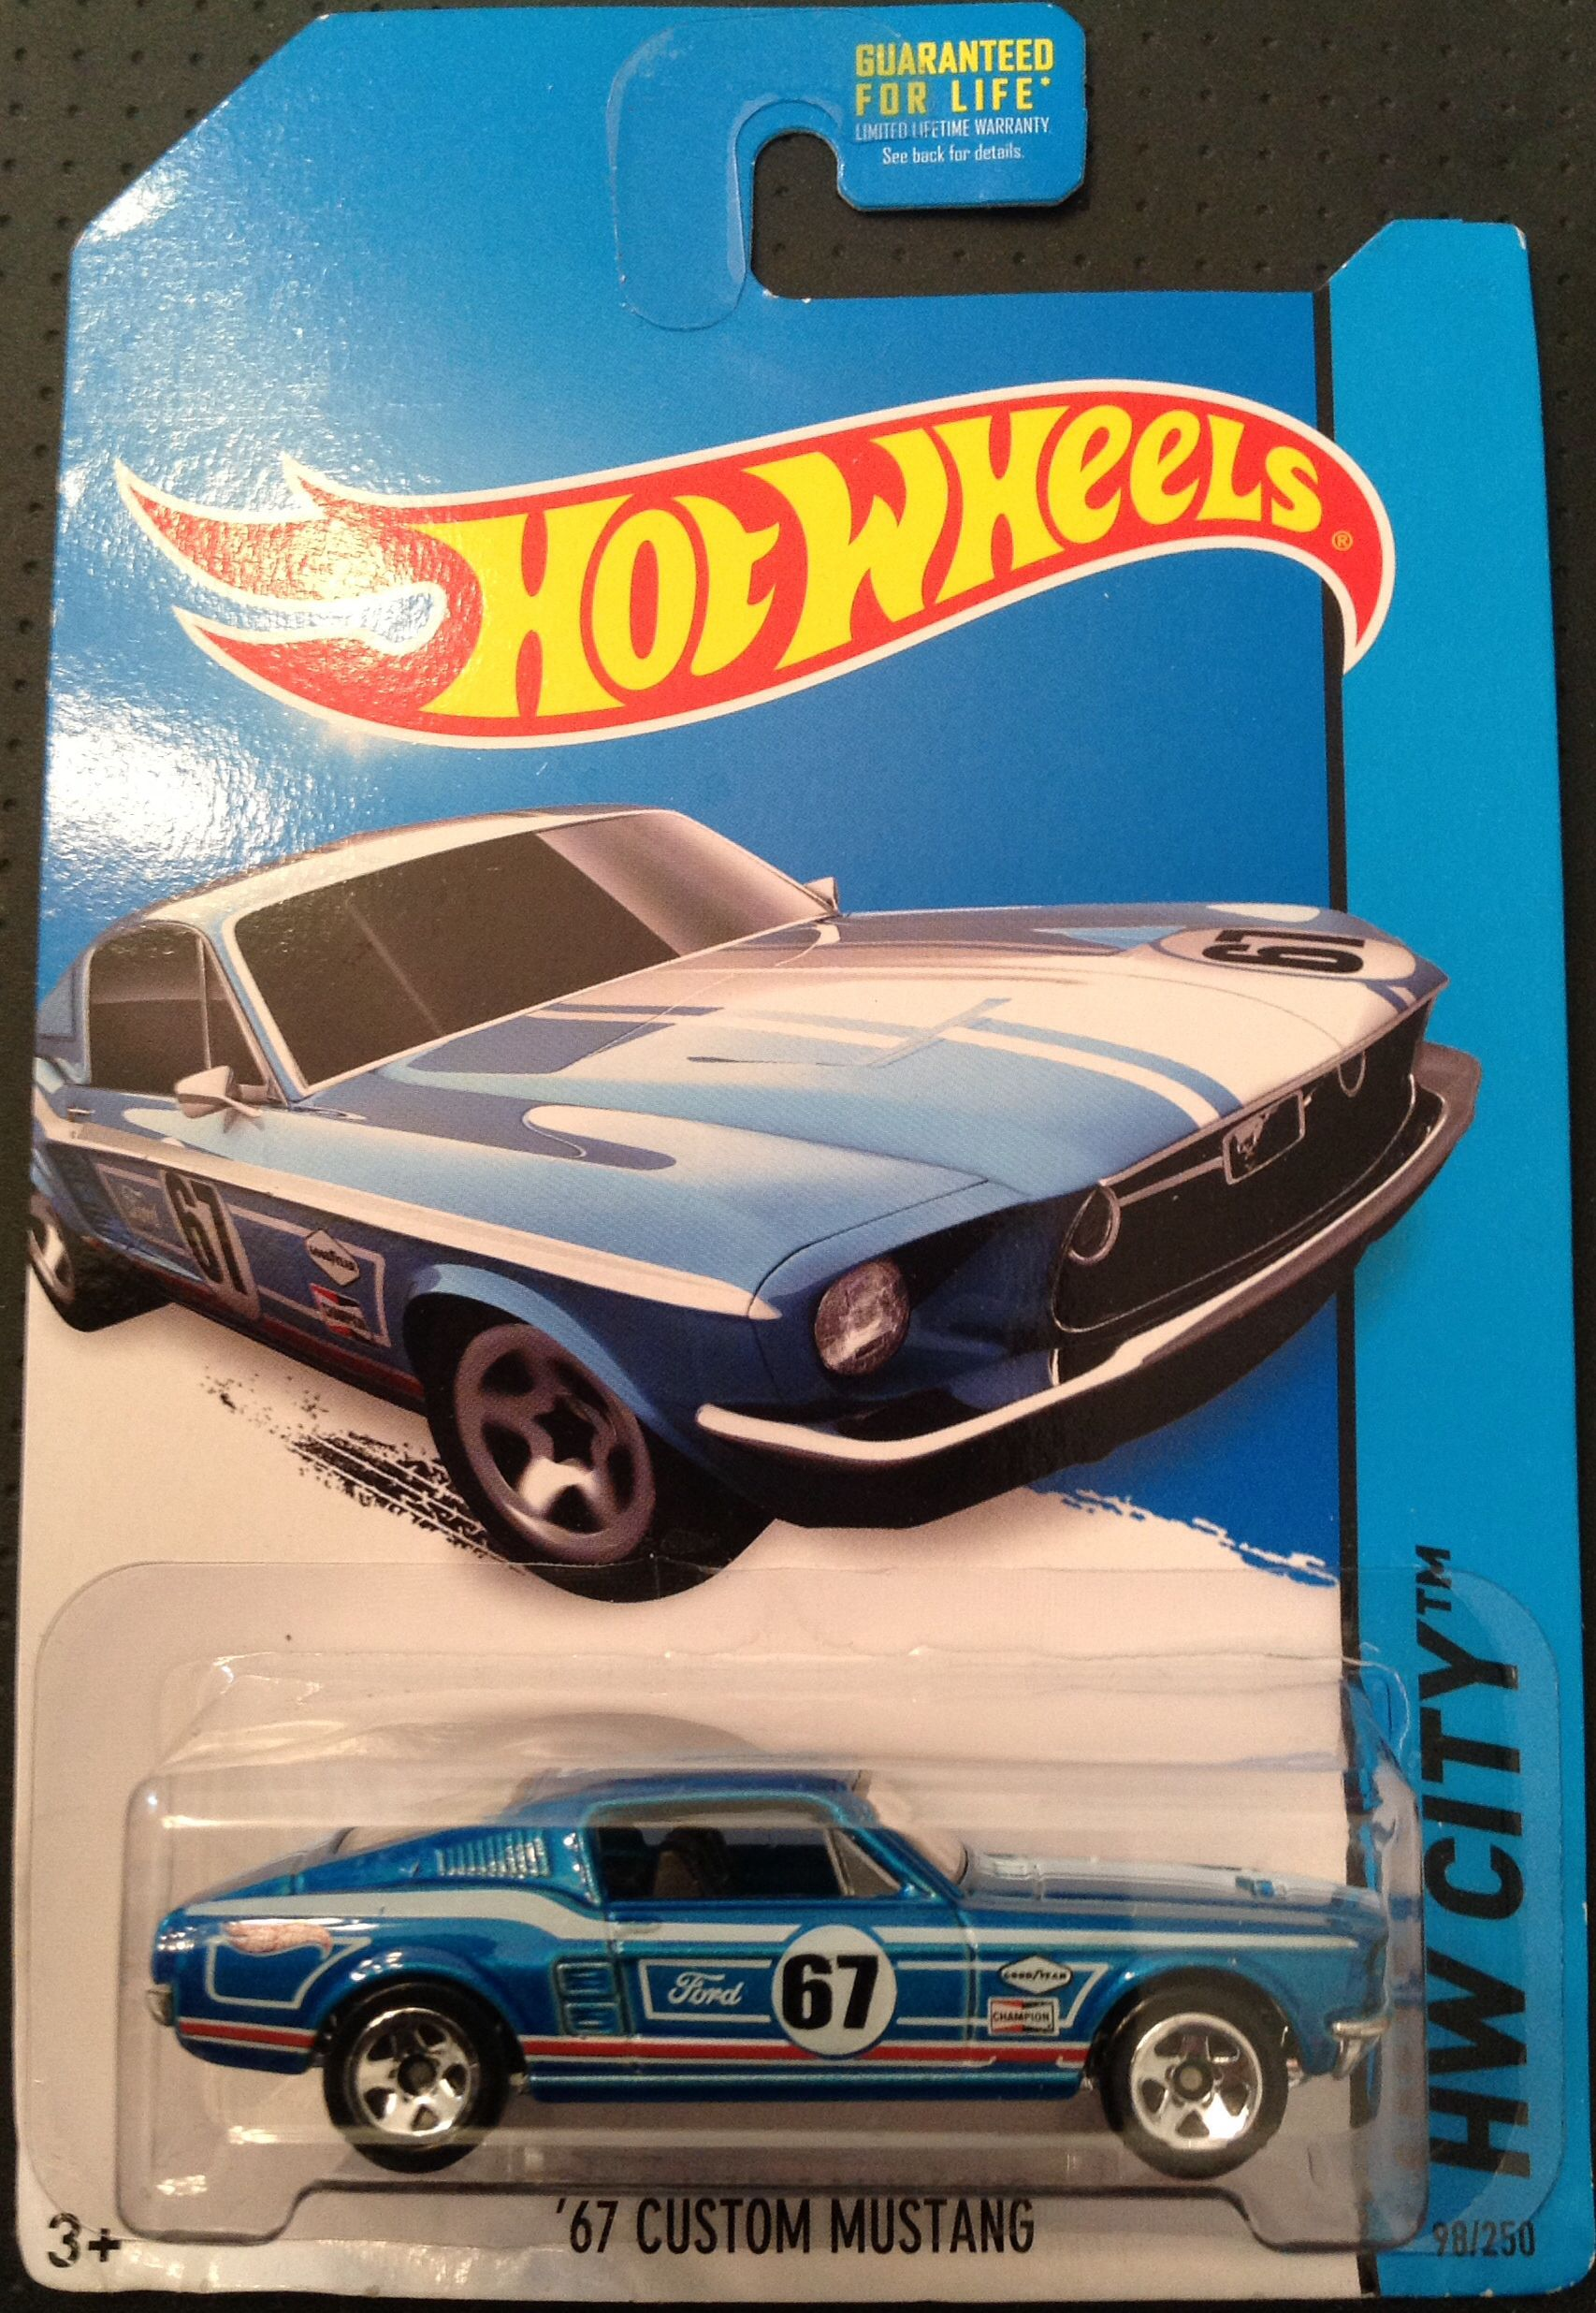 Hot Wheels 2014 Mustang 50th Hw City 98 250 67 Custom Mustang Blue With White And Pink Striping Hav Hot Wheels Mustang Hot Wheels Toys Mattel Hot Wheels